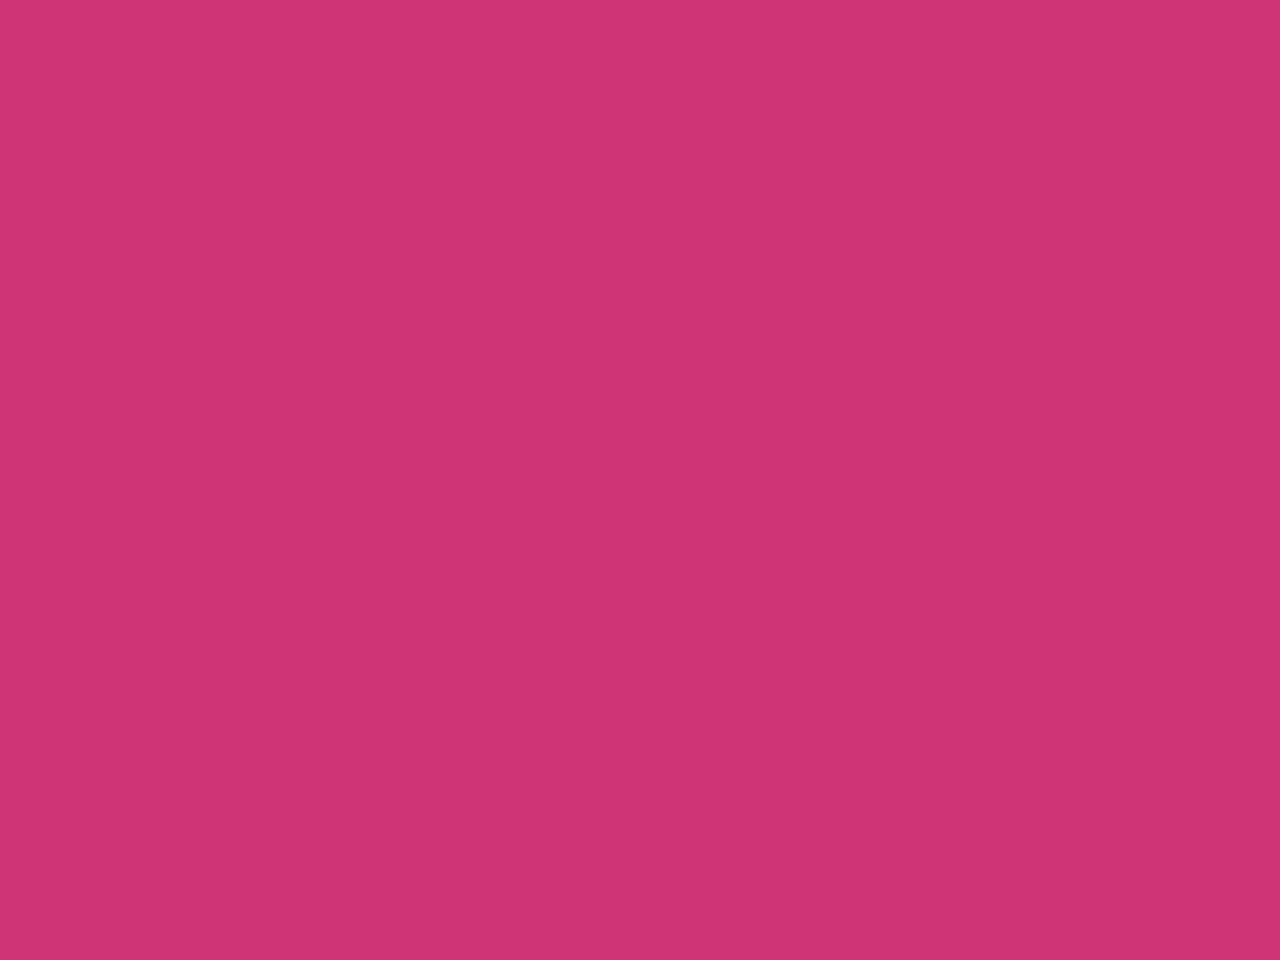 1280x960 Telemagenta Solid Color Background